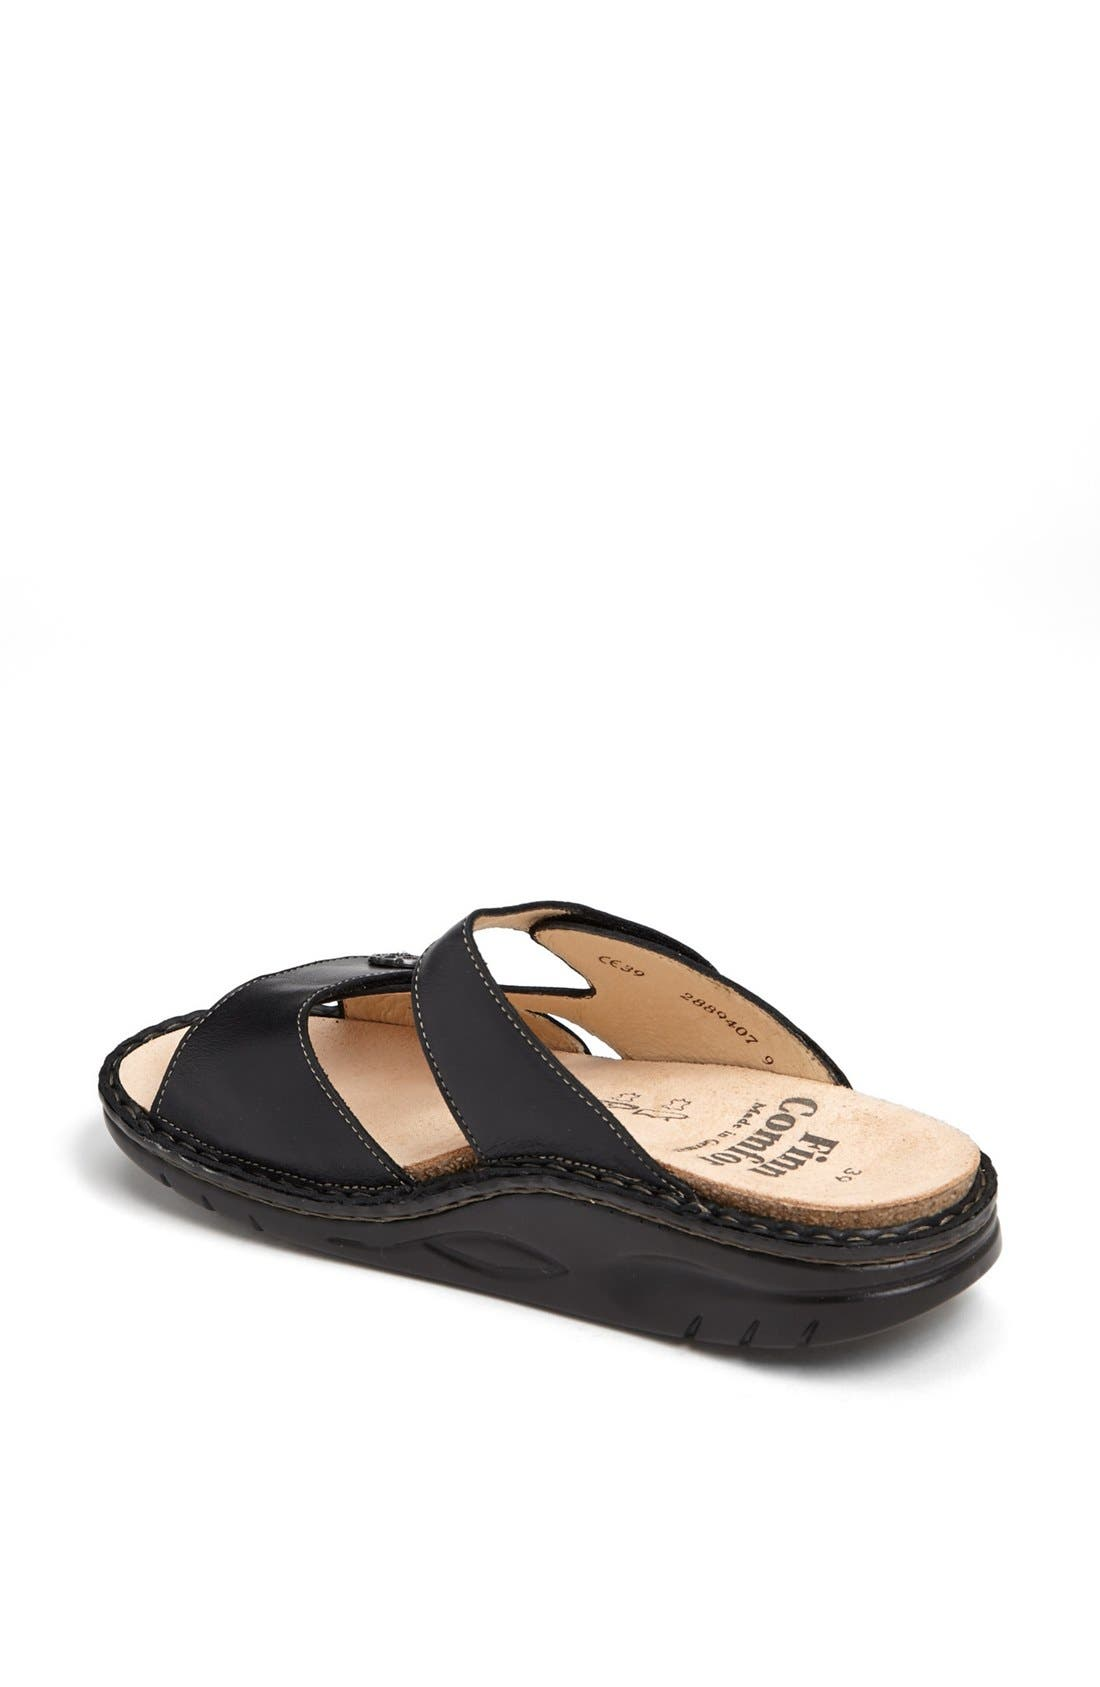 FINNAMIC by Finn Comfort 'Sanaa' Walking Sandal,                             Alternate thumbnail 2, color,                             Black